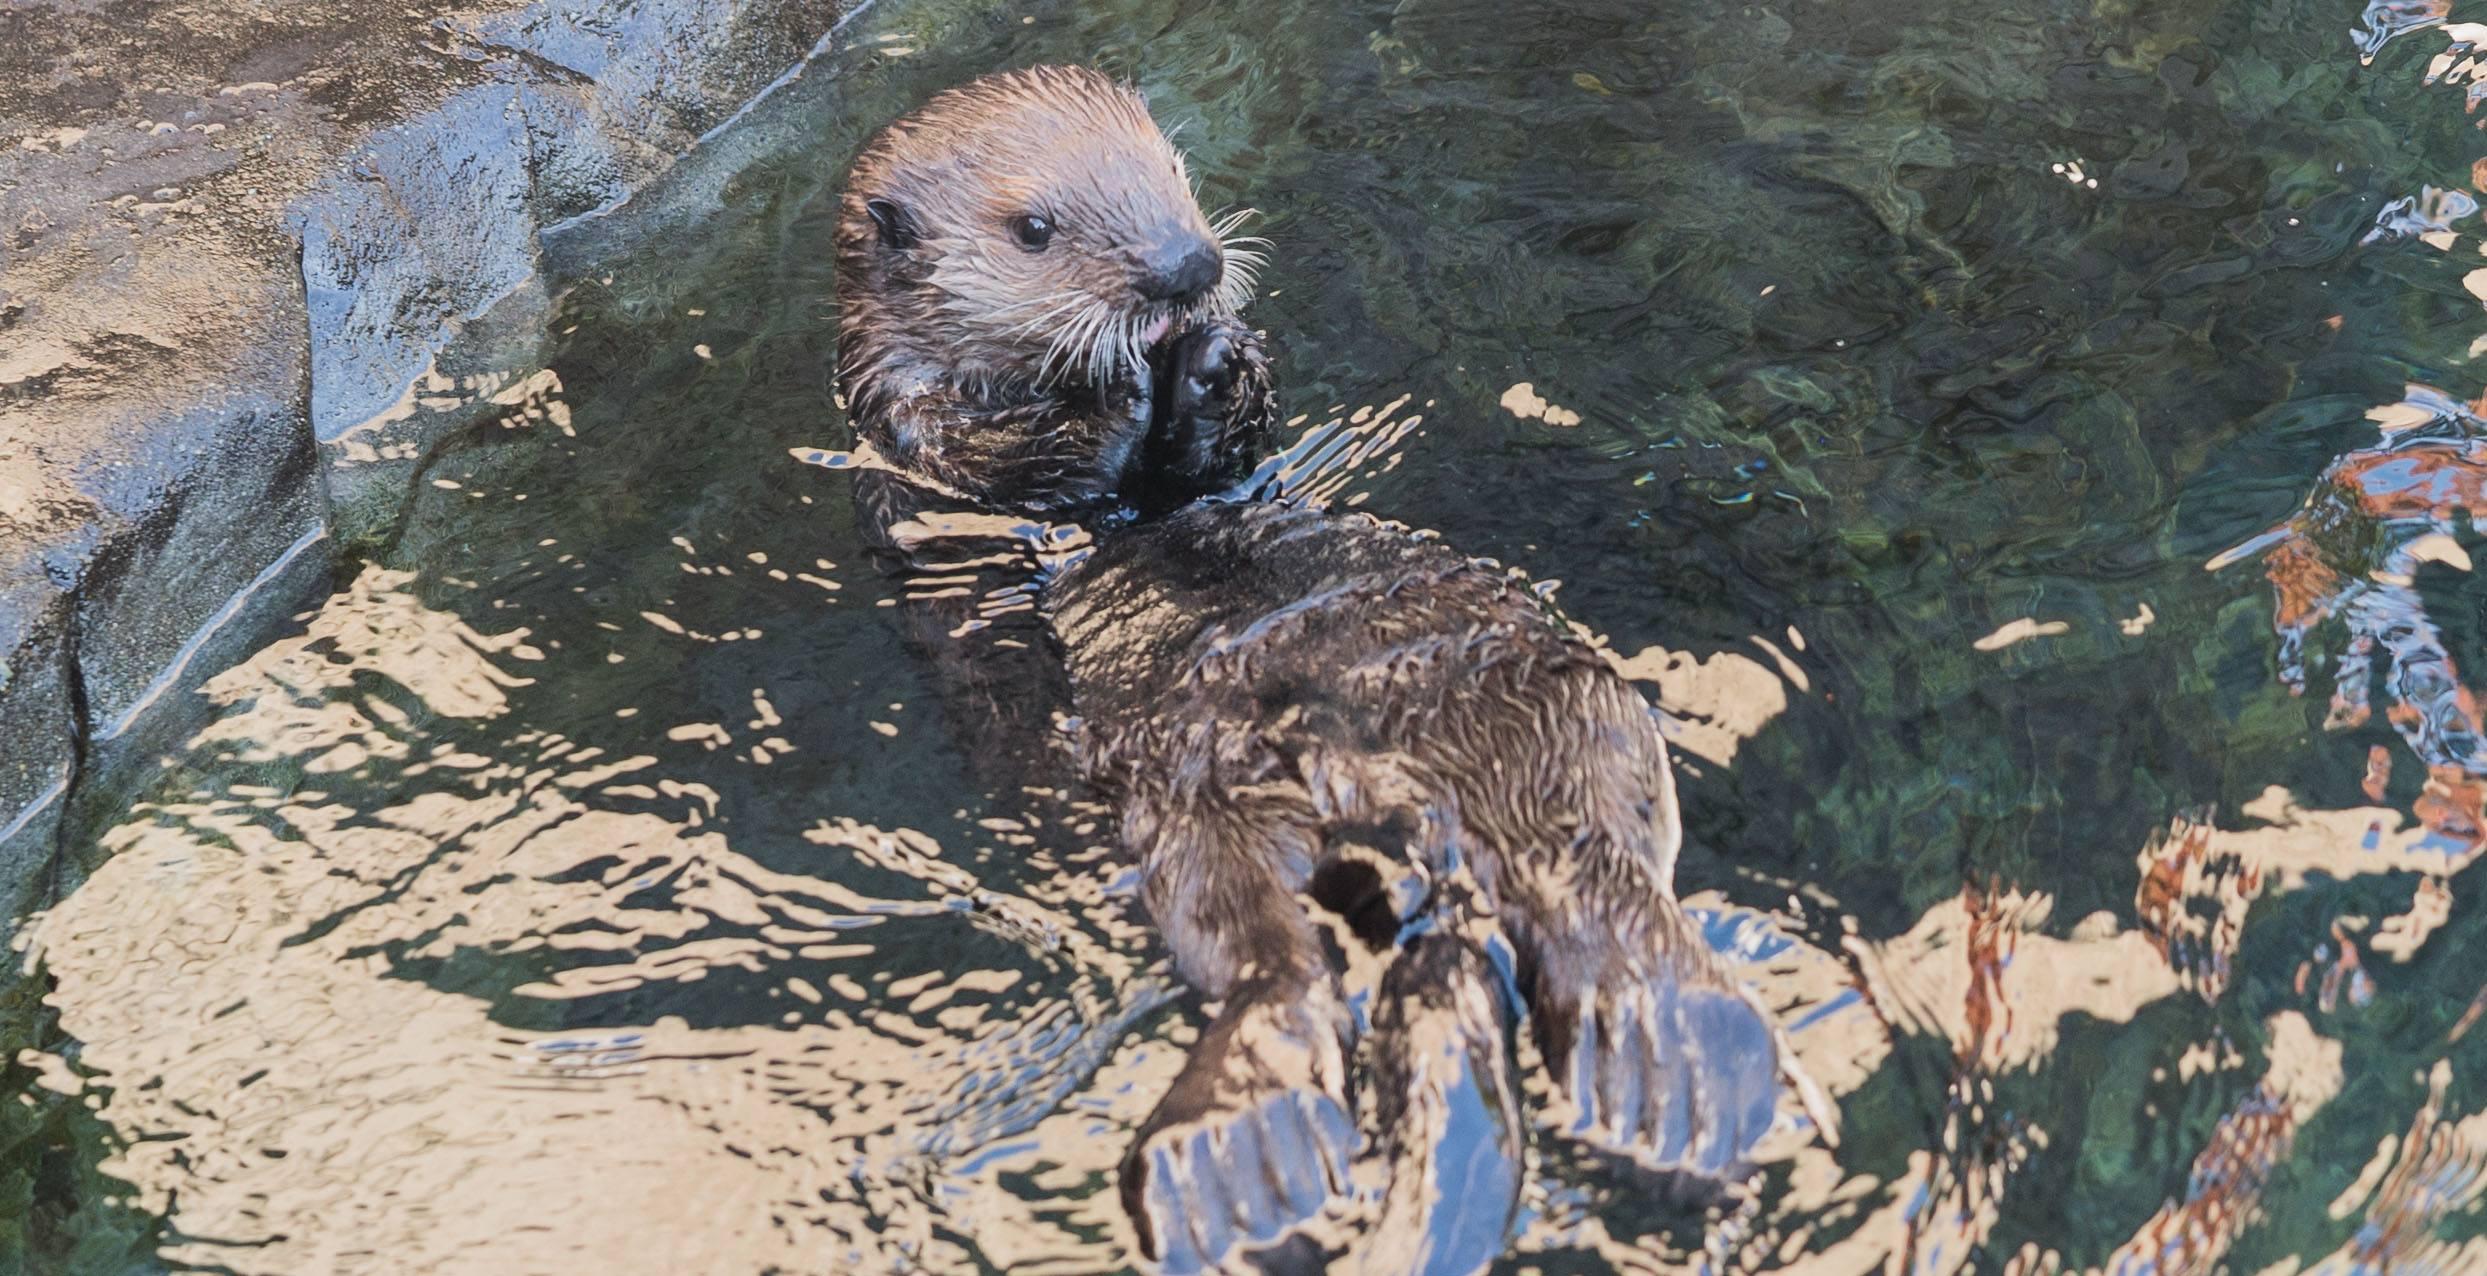 Hardy swimming (Vancouver Aquarium)